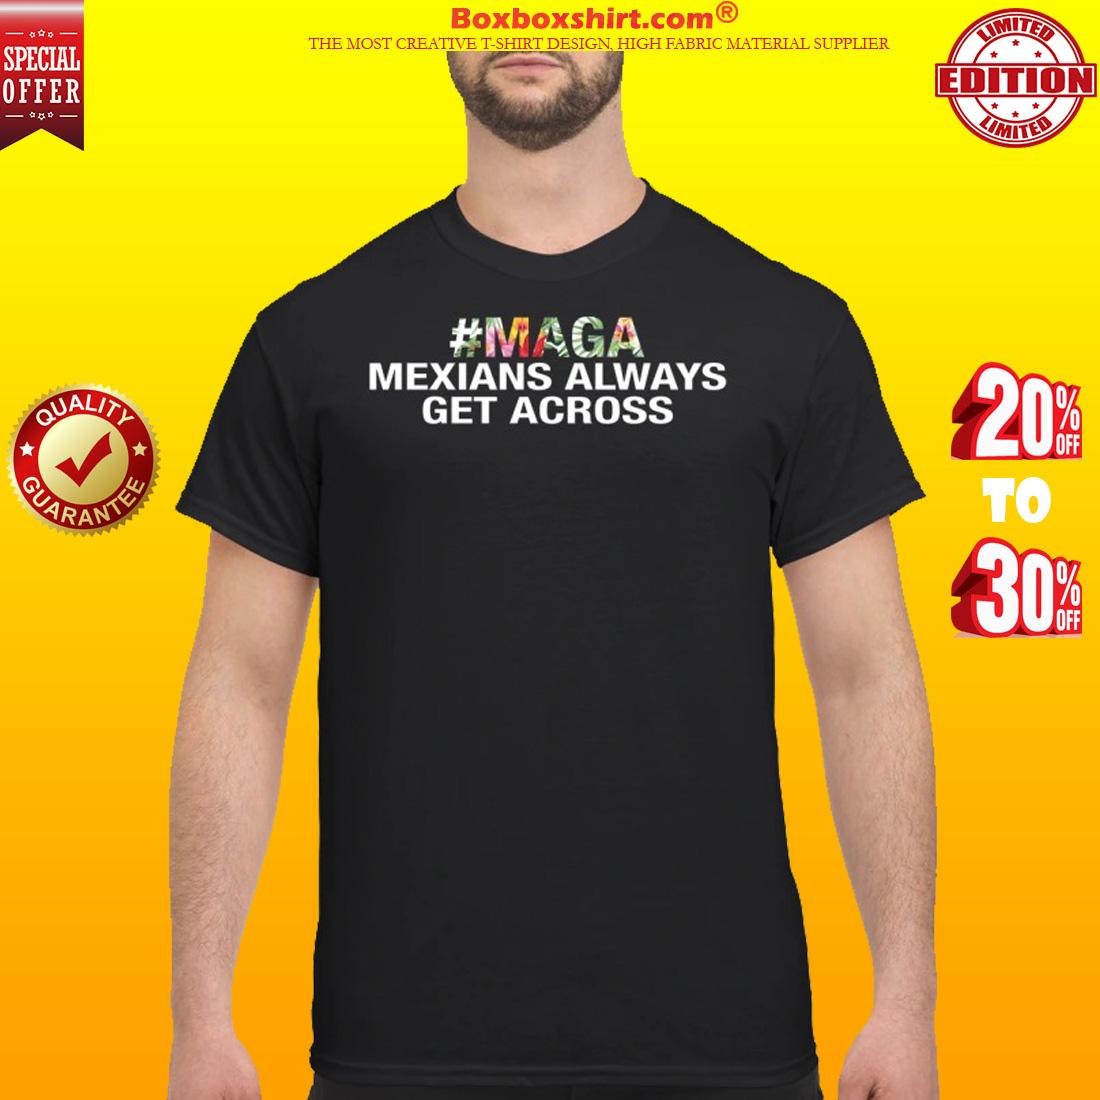 Maga mexians always get accross classic shirt